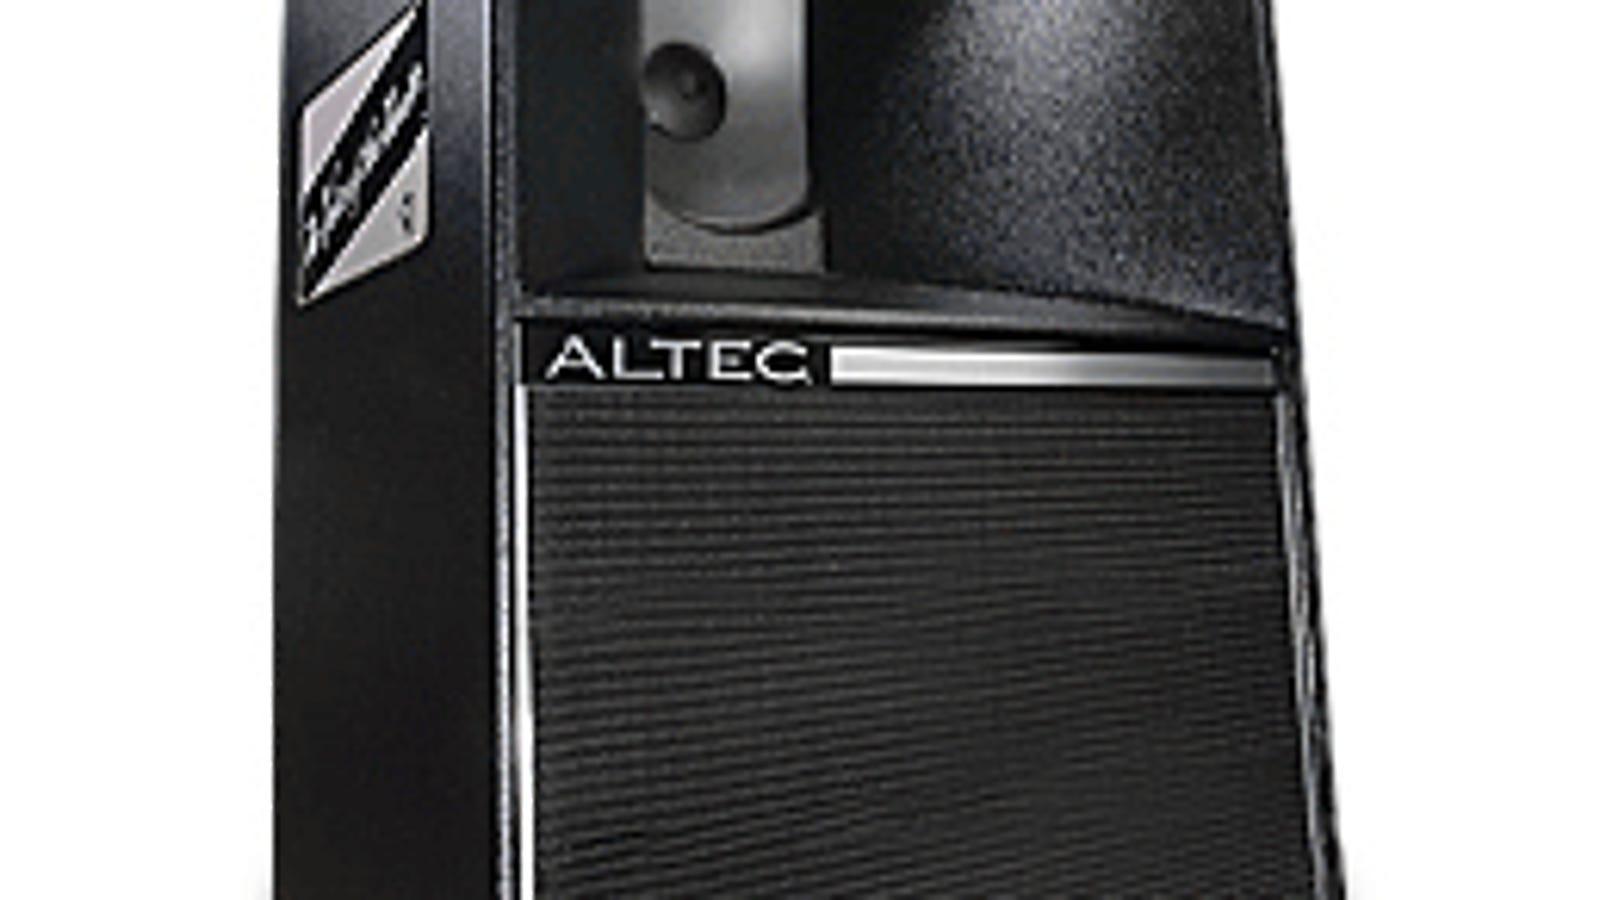 Altec Lansing A7: 1950s Studio Monitors for $6100 Each